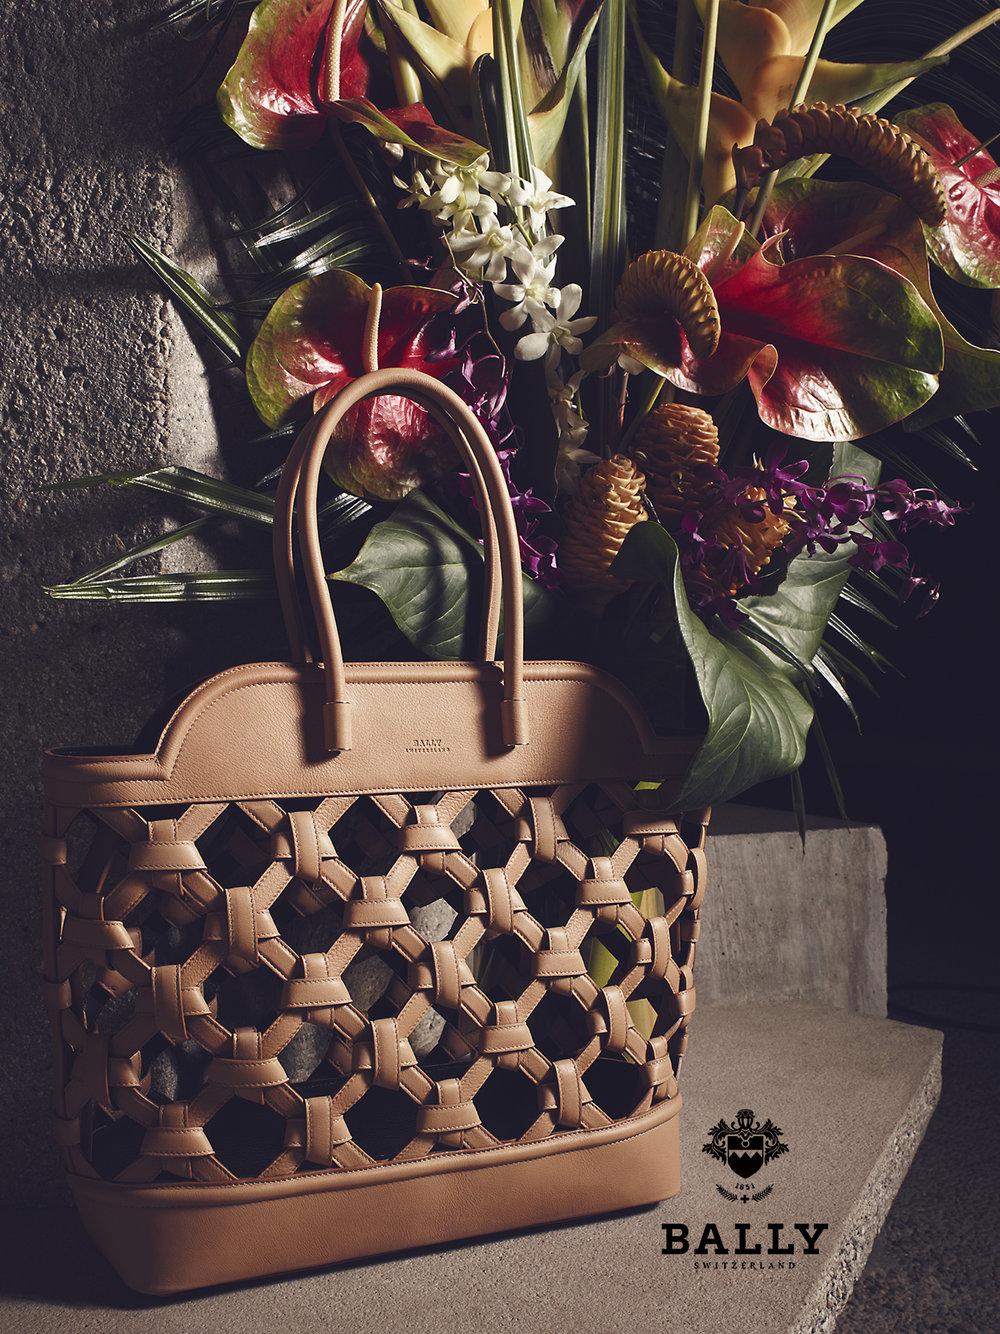 BALLY Handbags.jpg